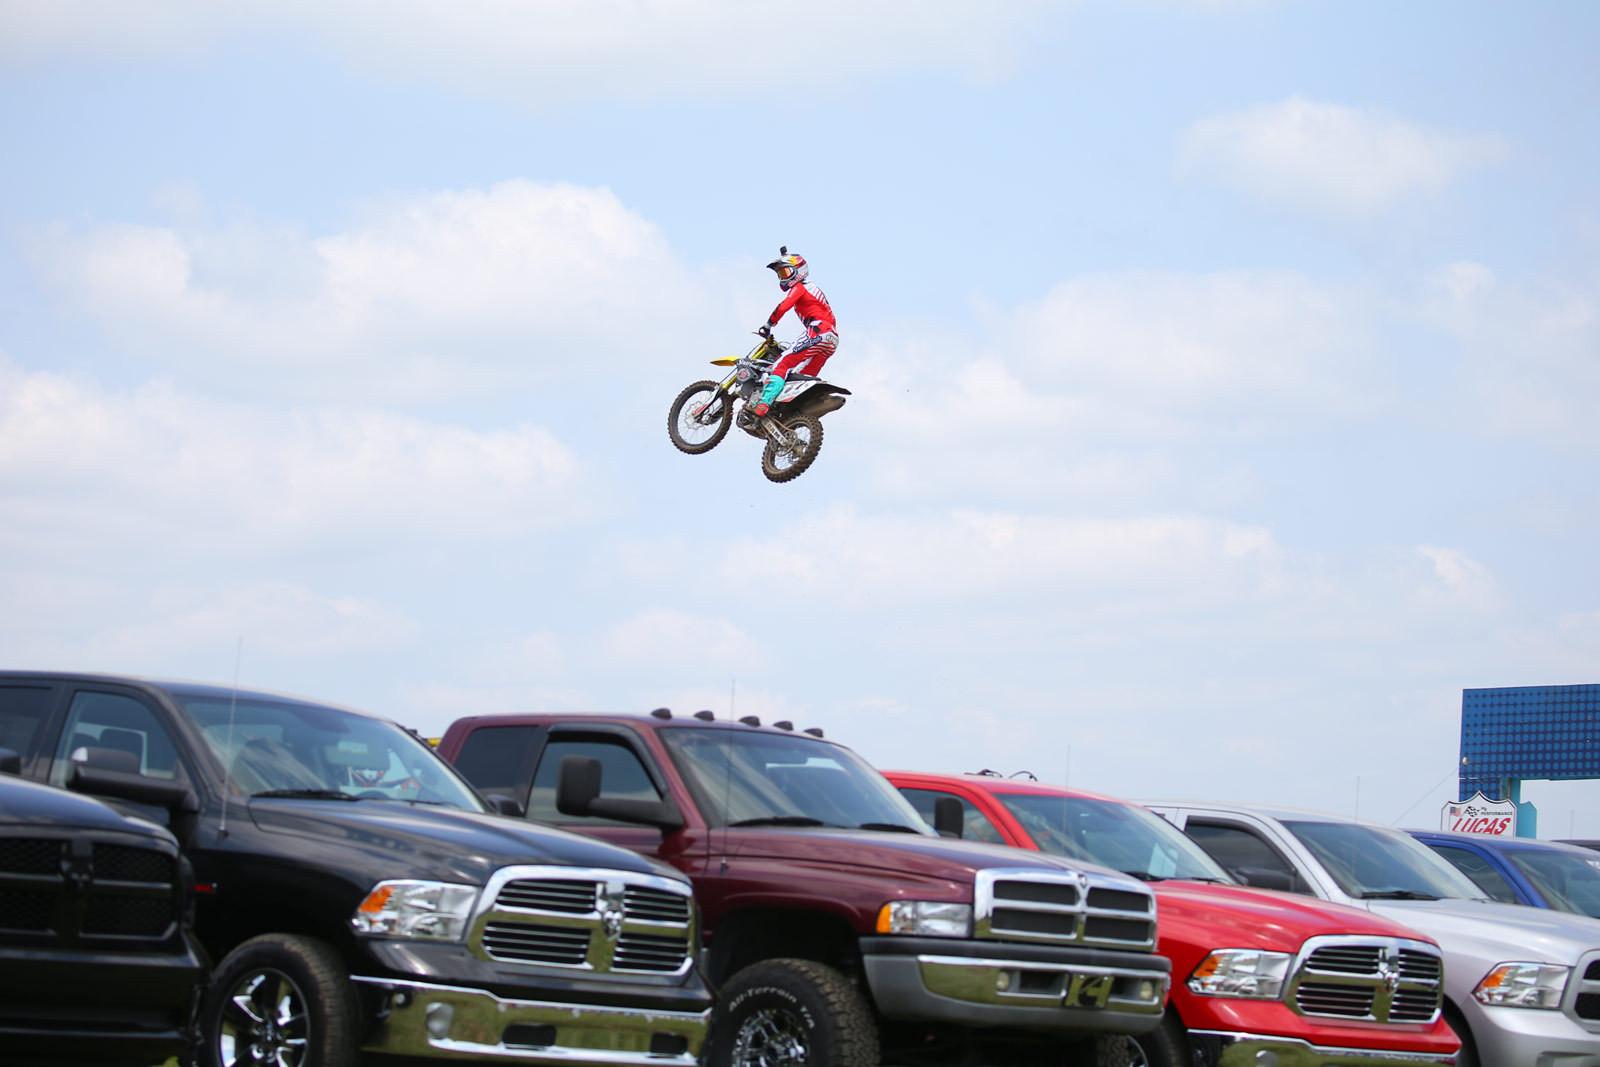 070615pb061 - Vital MX Pit Bits: RedBud - Motocross Pictures - Vital MX